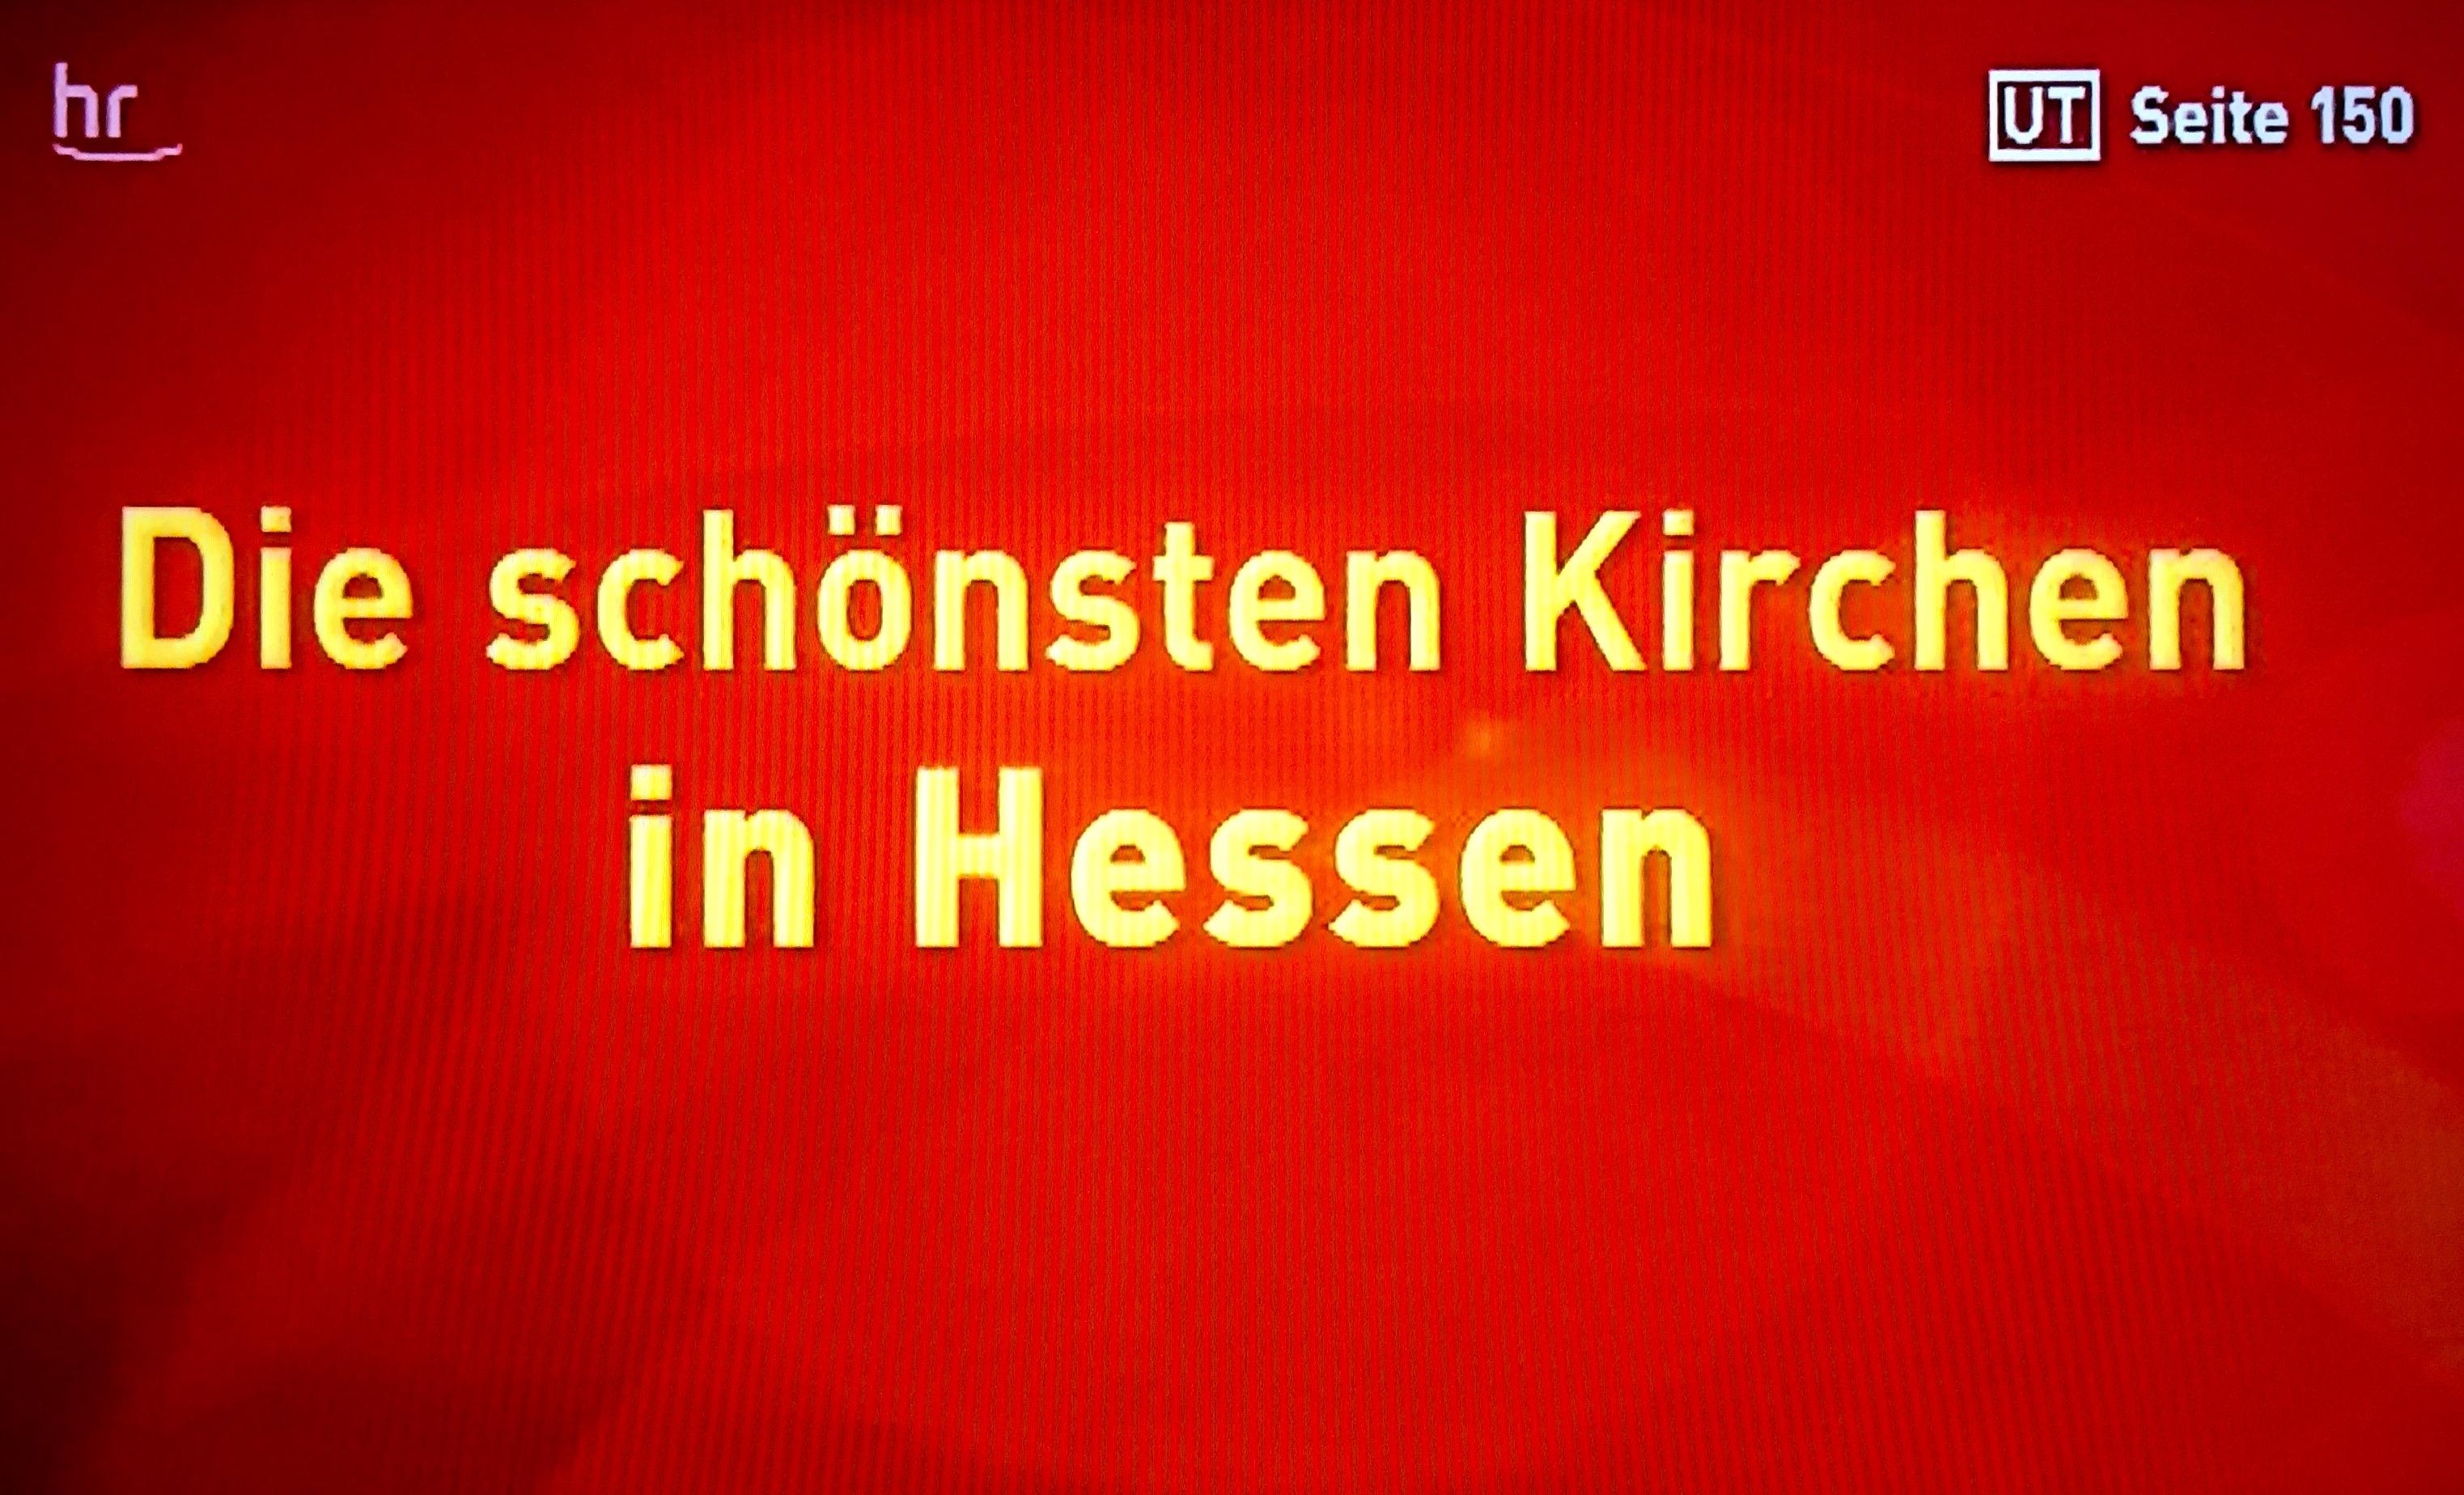 Hessen Sommerküche : Hessen à la carte videos der sendung hr ard mediathek